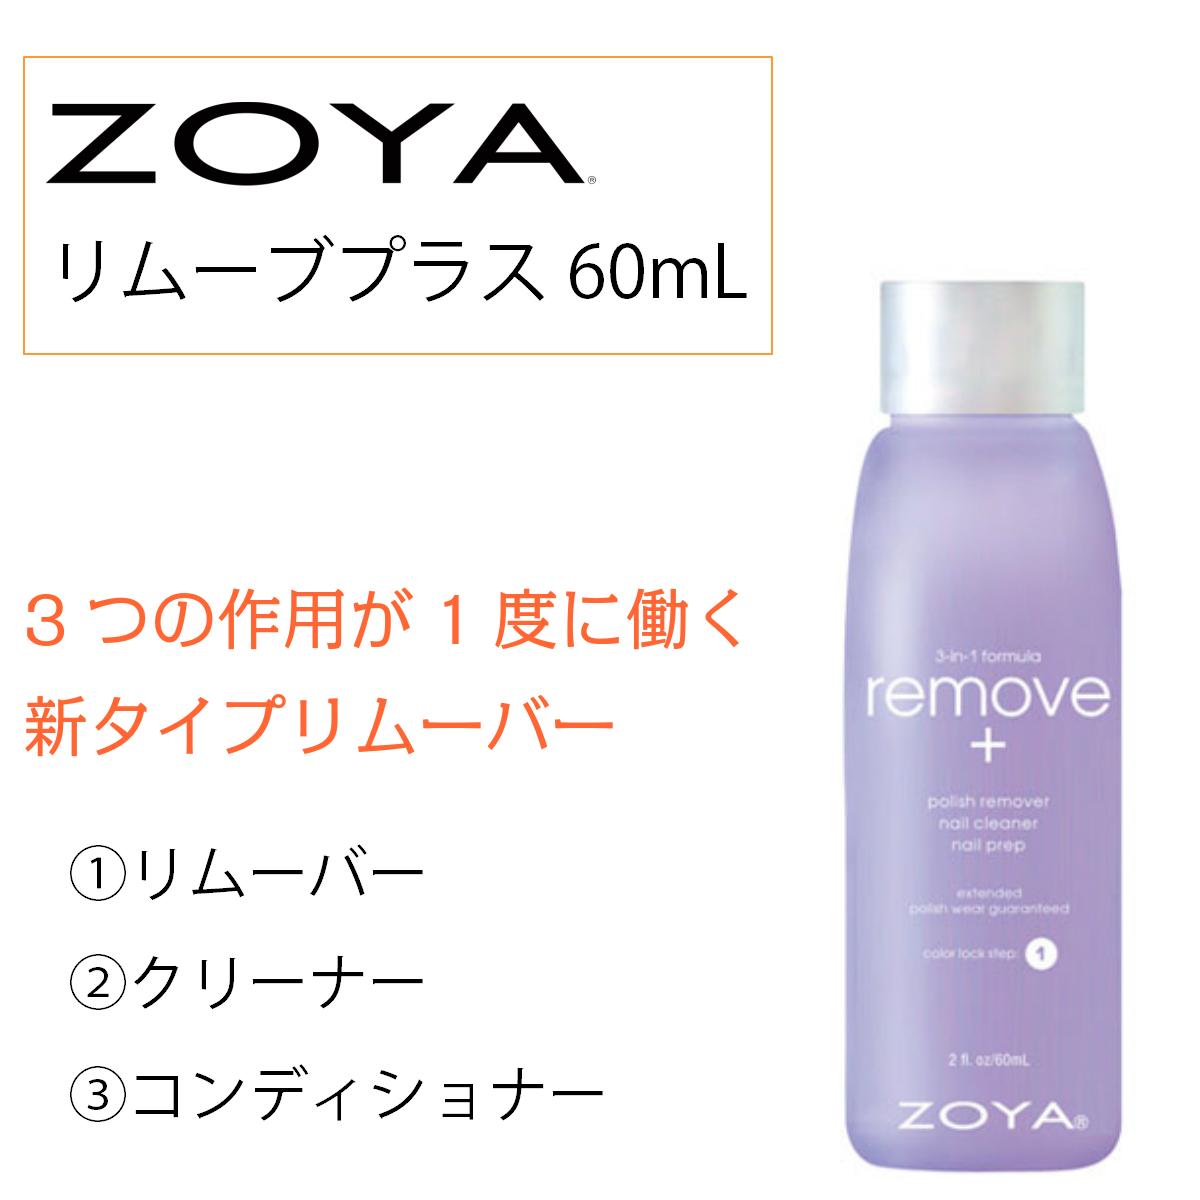 ZOYA ゾヤ ゾーヤ リムーブプラス ZTRMAF 60ml 除光液 リムーバー クリーナー プレッツ 検定 自爪 の為に作られた ネイル にやさしい ネイルカラー 自然派 リムーバー zoya セルフネイル にもおすすめ